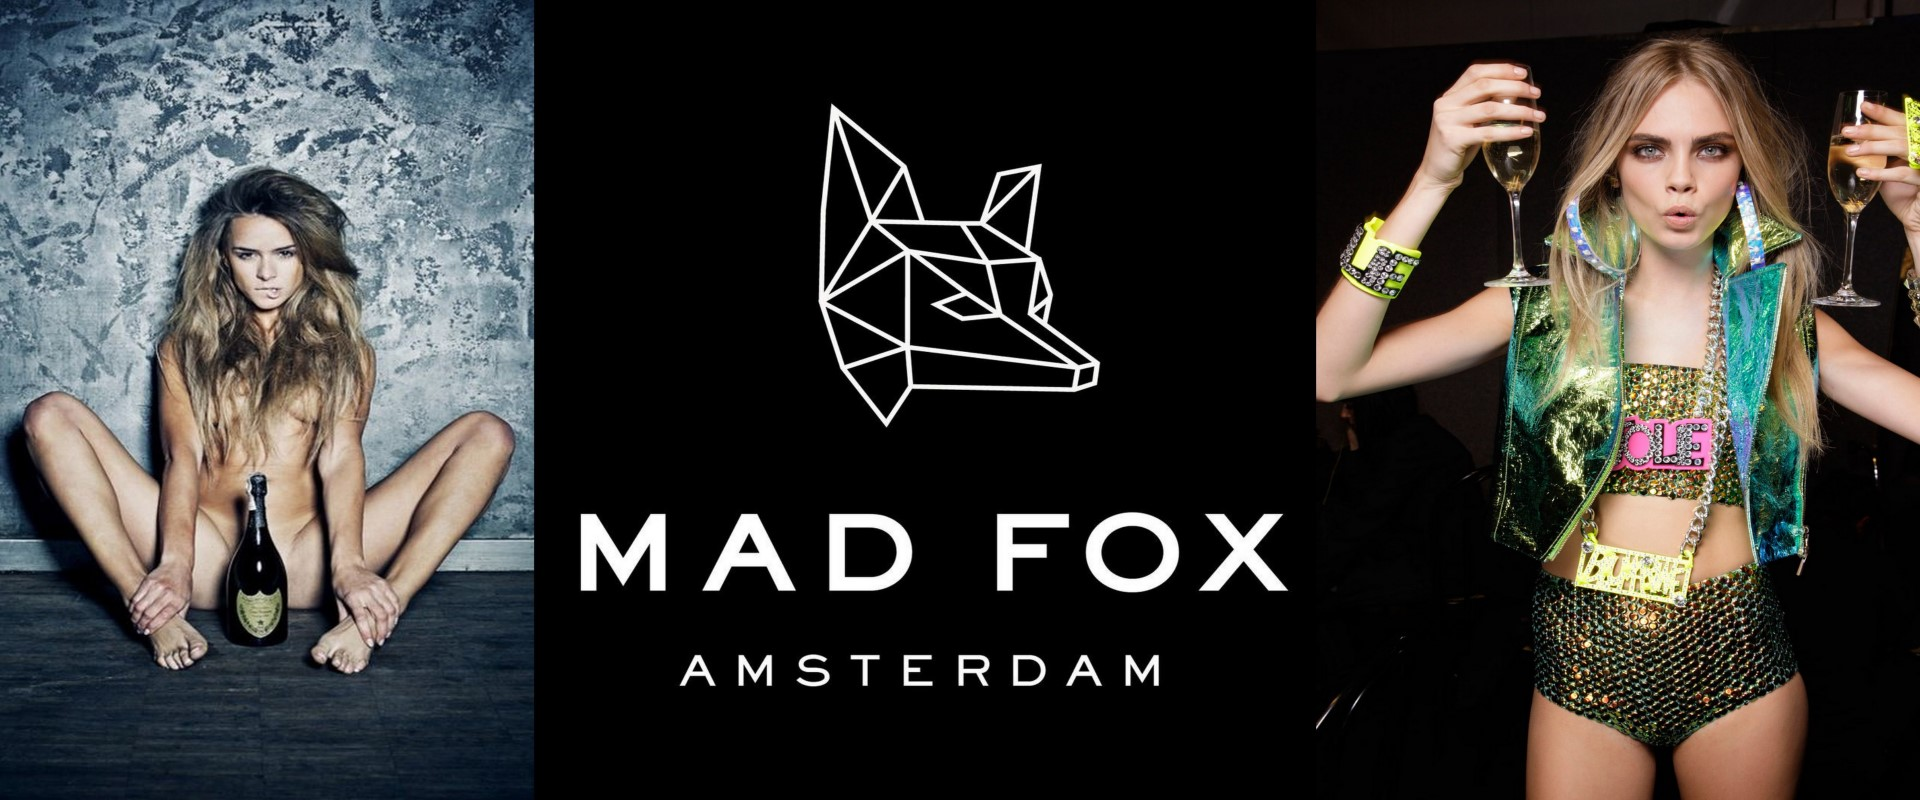 Mad_Fox_Glamourland